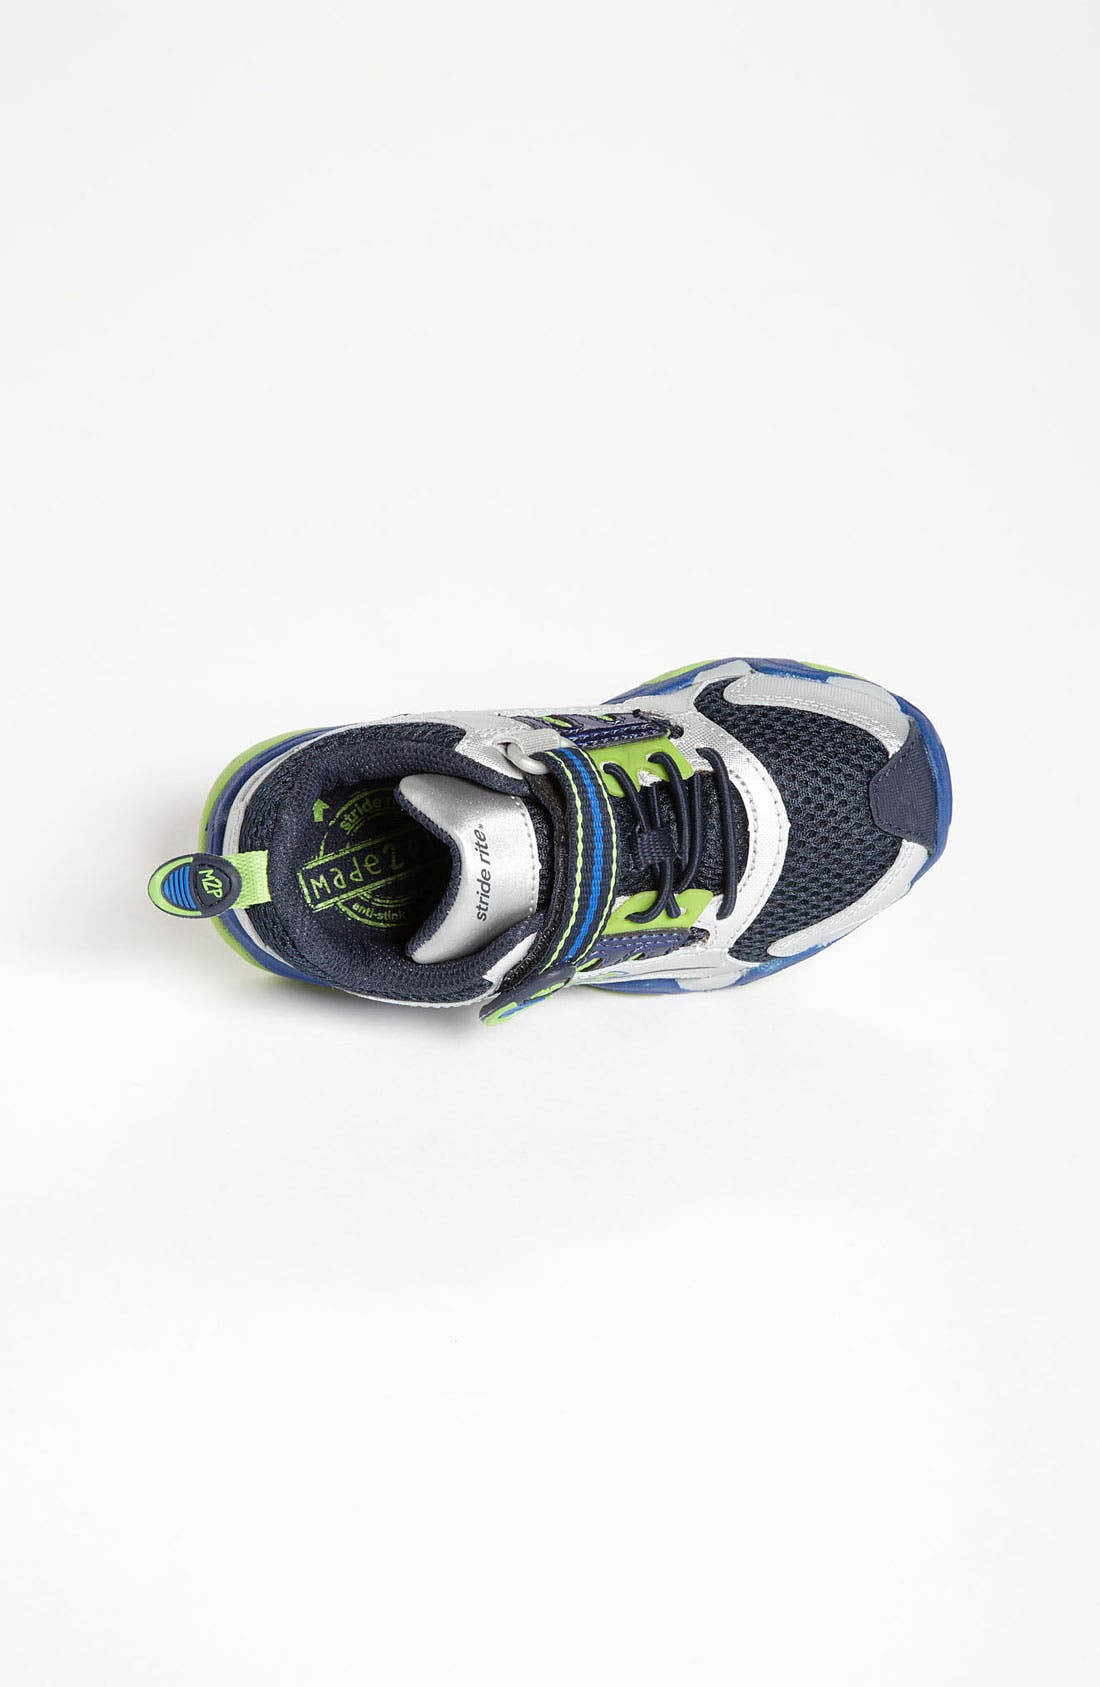 Alternate Image 3  - Stride Rite 'Thorpe' Sneaker (Toddler)